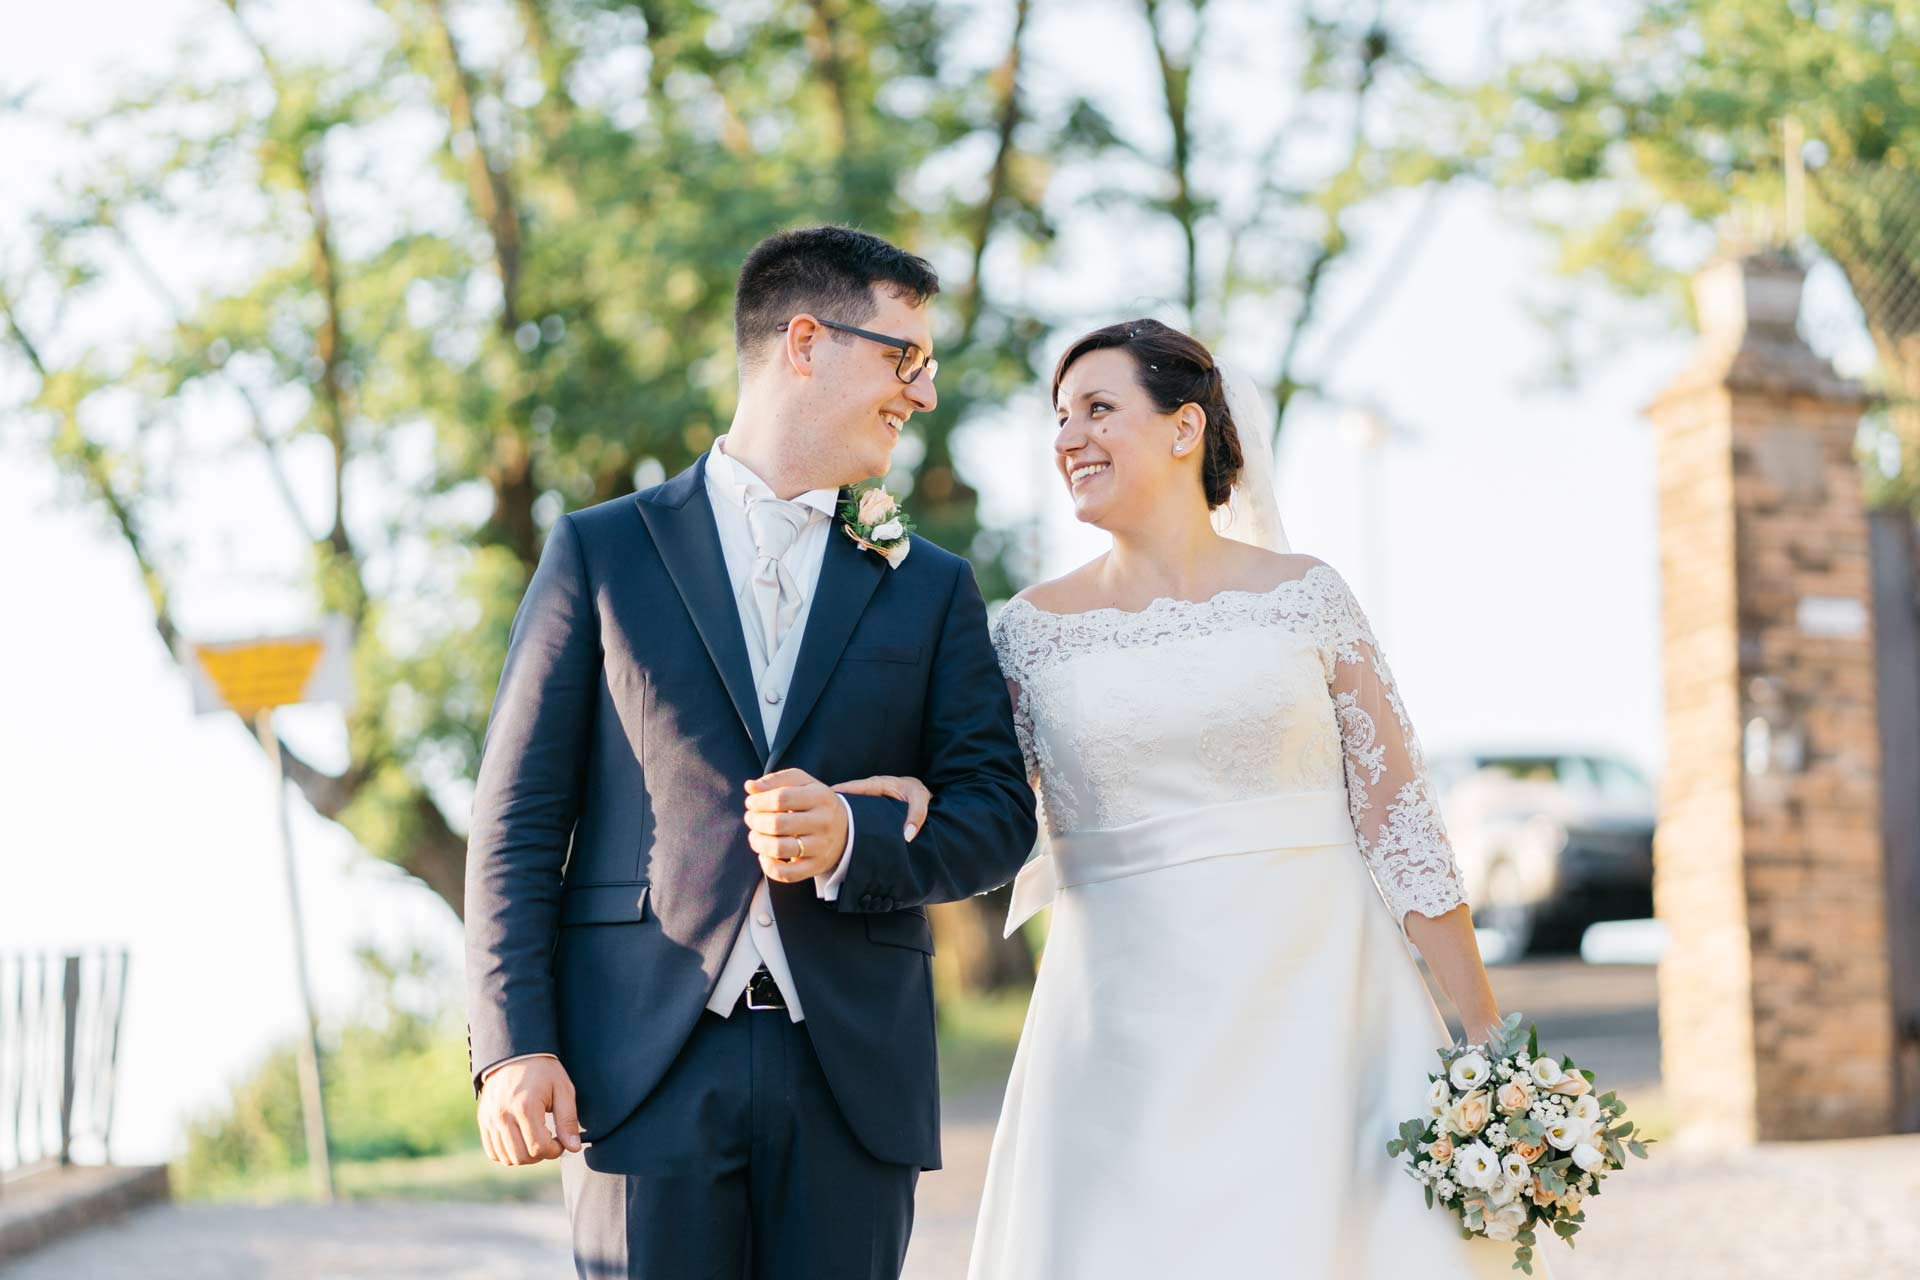 fotografo-matrimonio-roma-s&g2-simone-nunzi